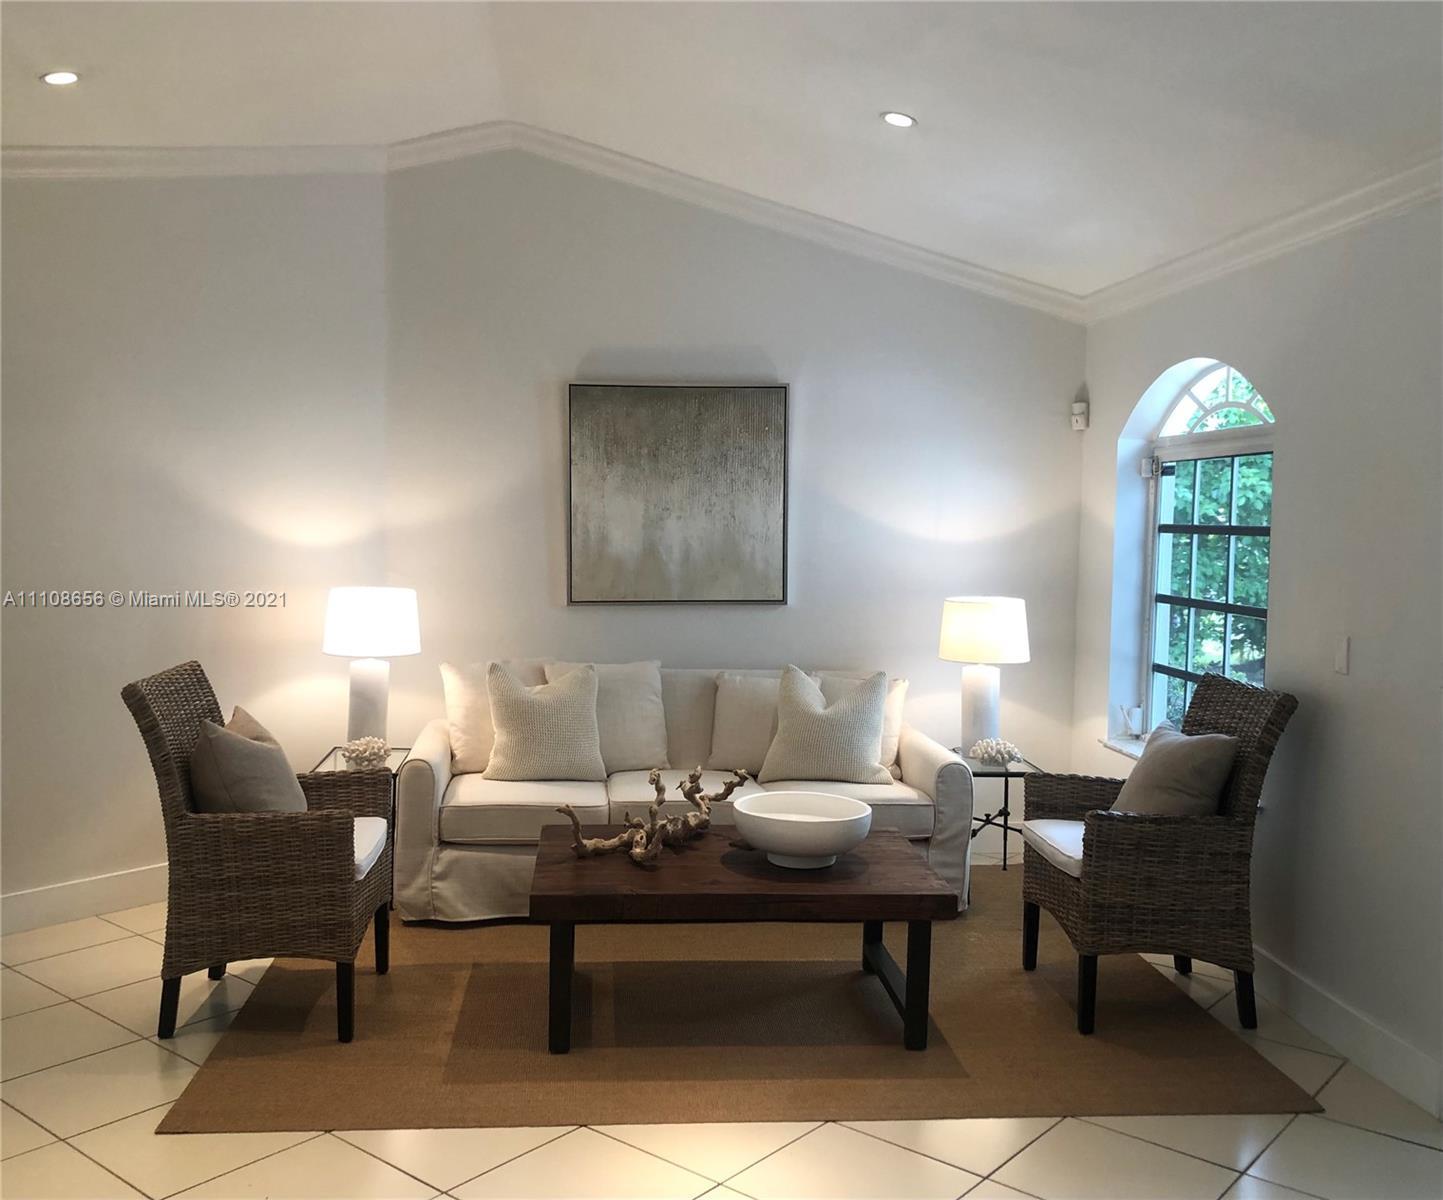 Tropical Isle Homes - 515 Woodcrest Rd, Key Biscayne, FL 33149